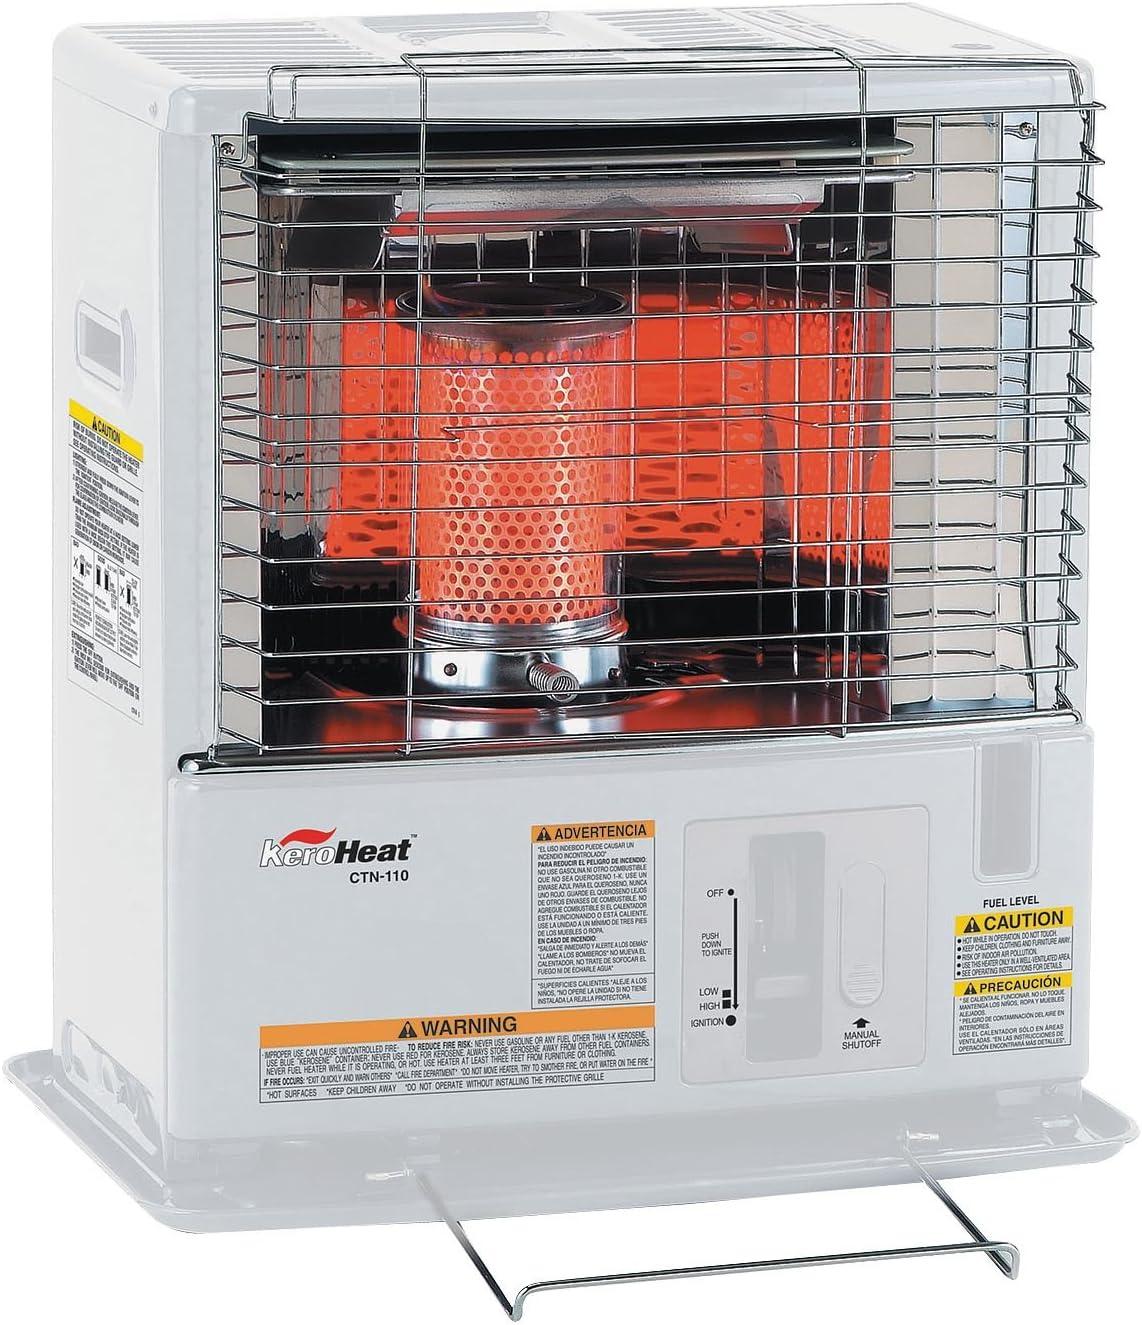 Sengoku KeroHeat Portable Radiant Kerosene Heater